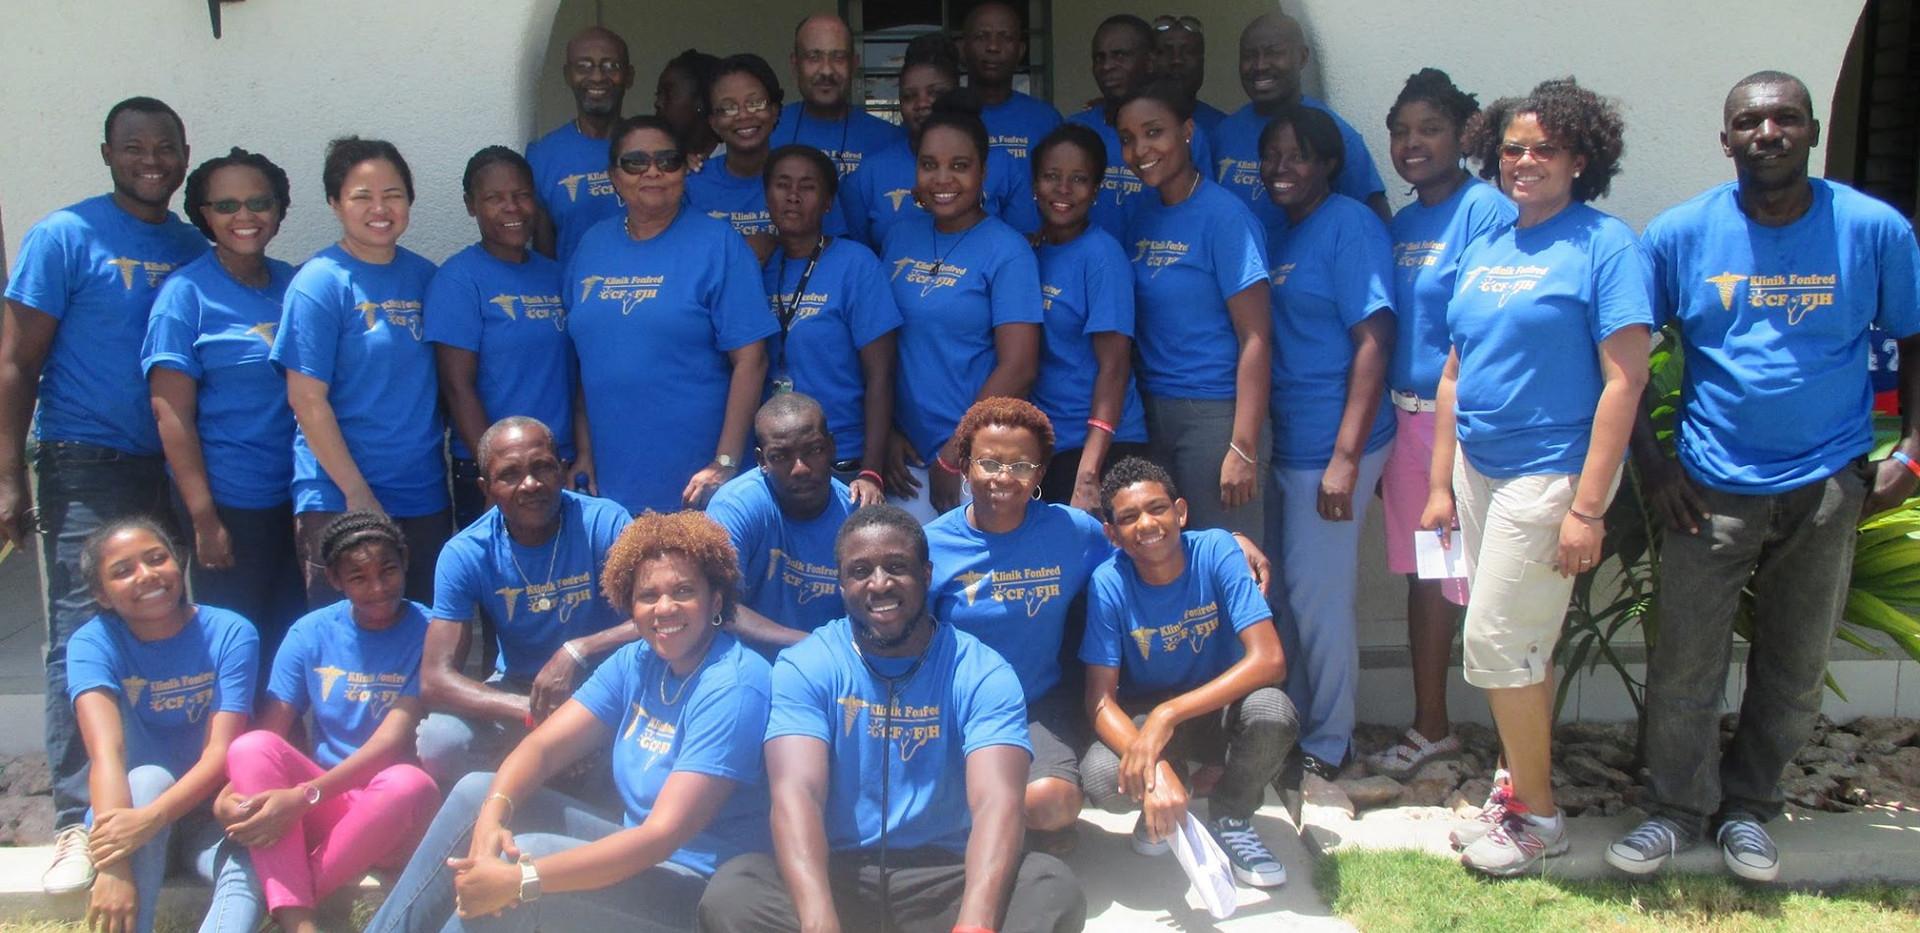 2017 medical mission team.jpg